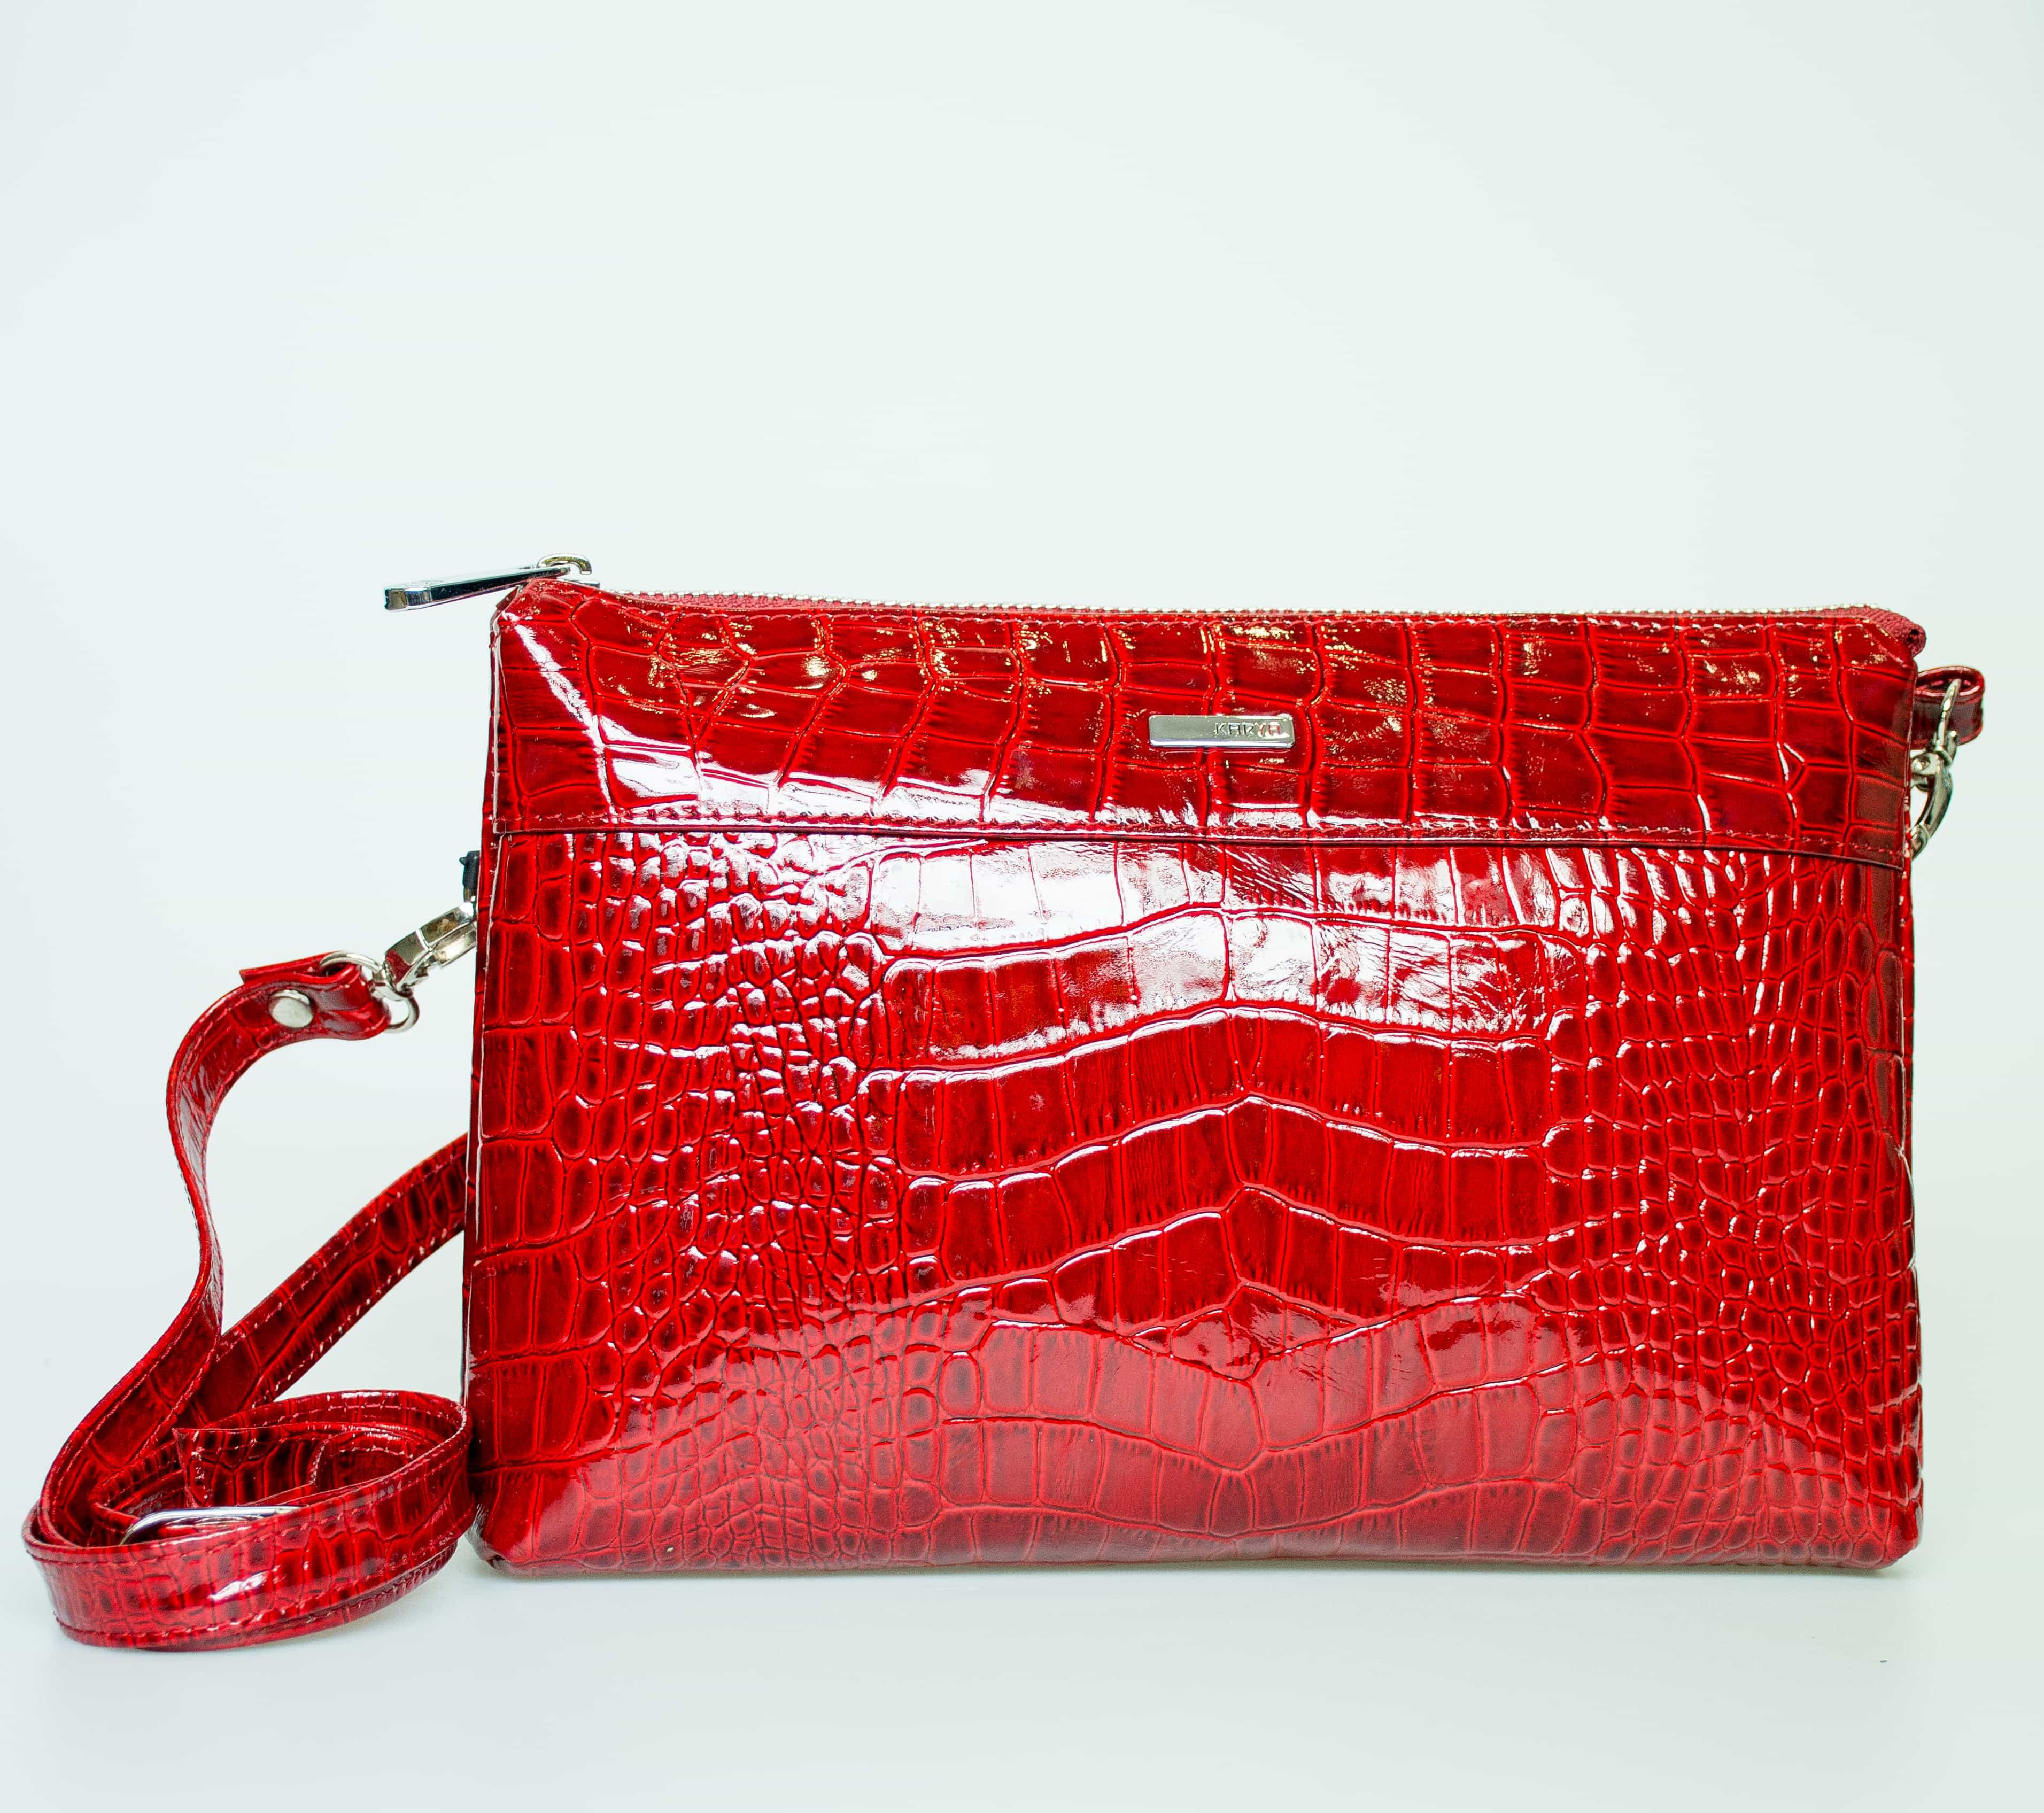 Женская кожаная сумка  KARYA 0759-08